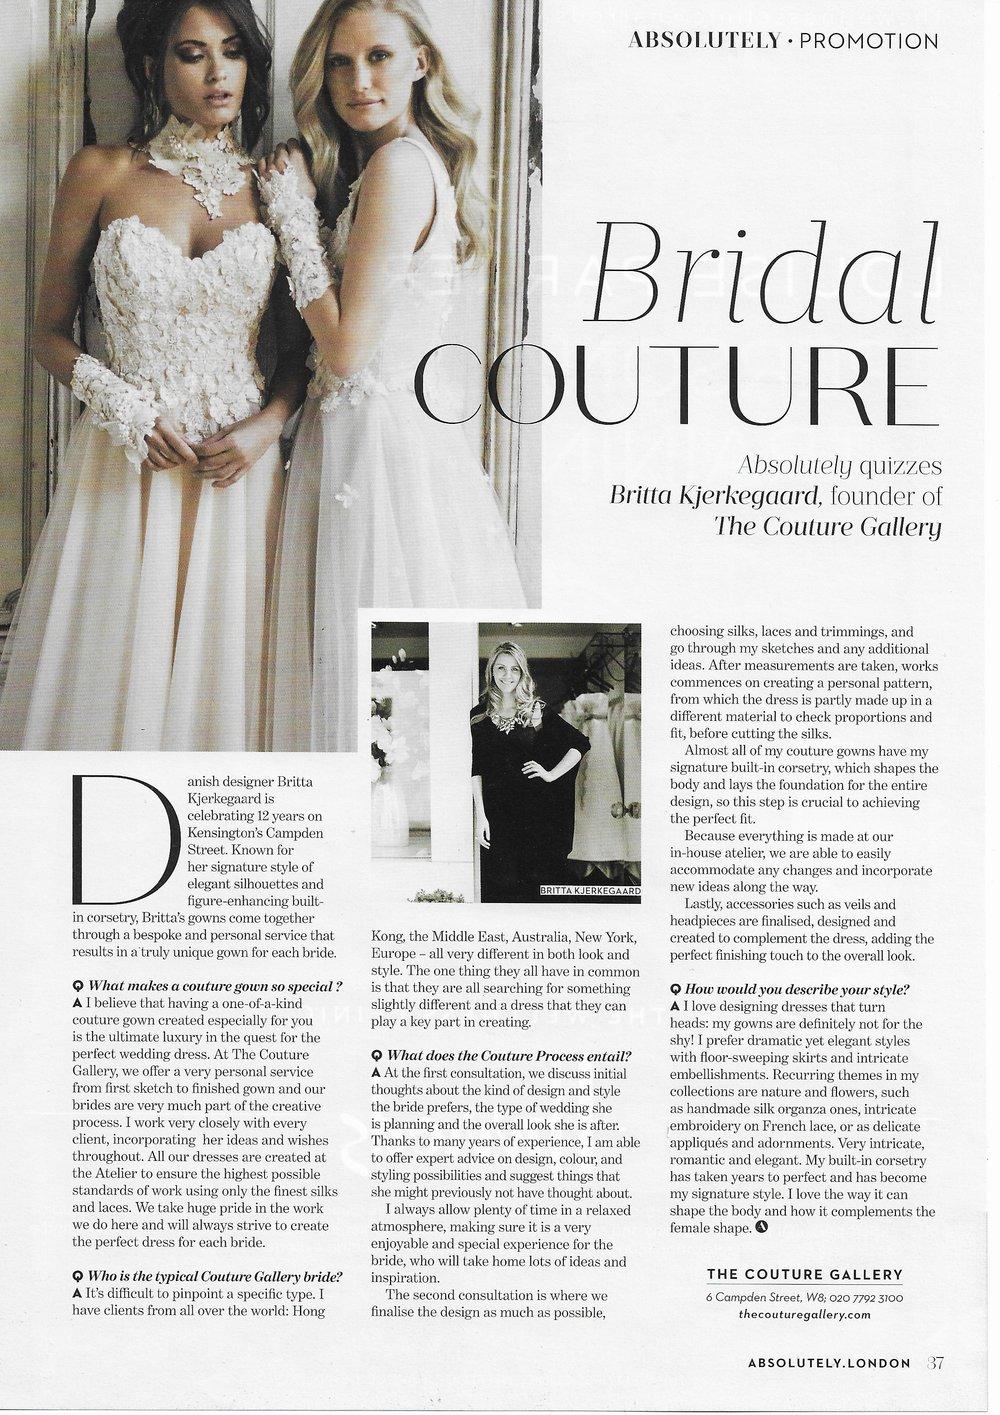 Absolutely Magazine Jan 2018 - Interview with Britta Kjerkegaard